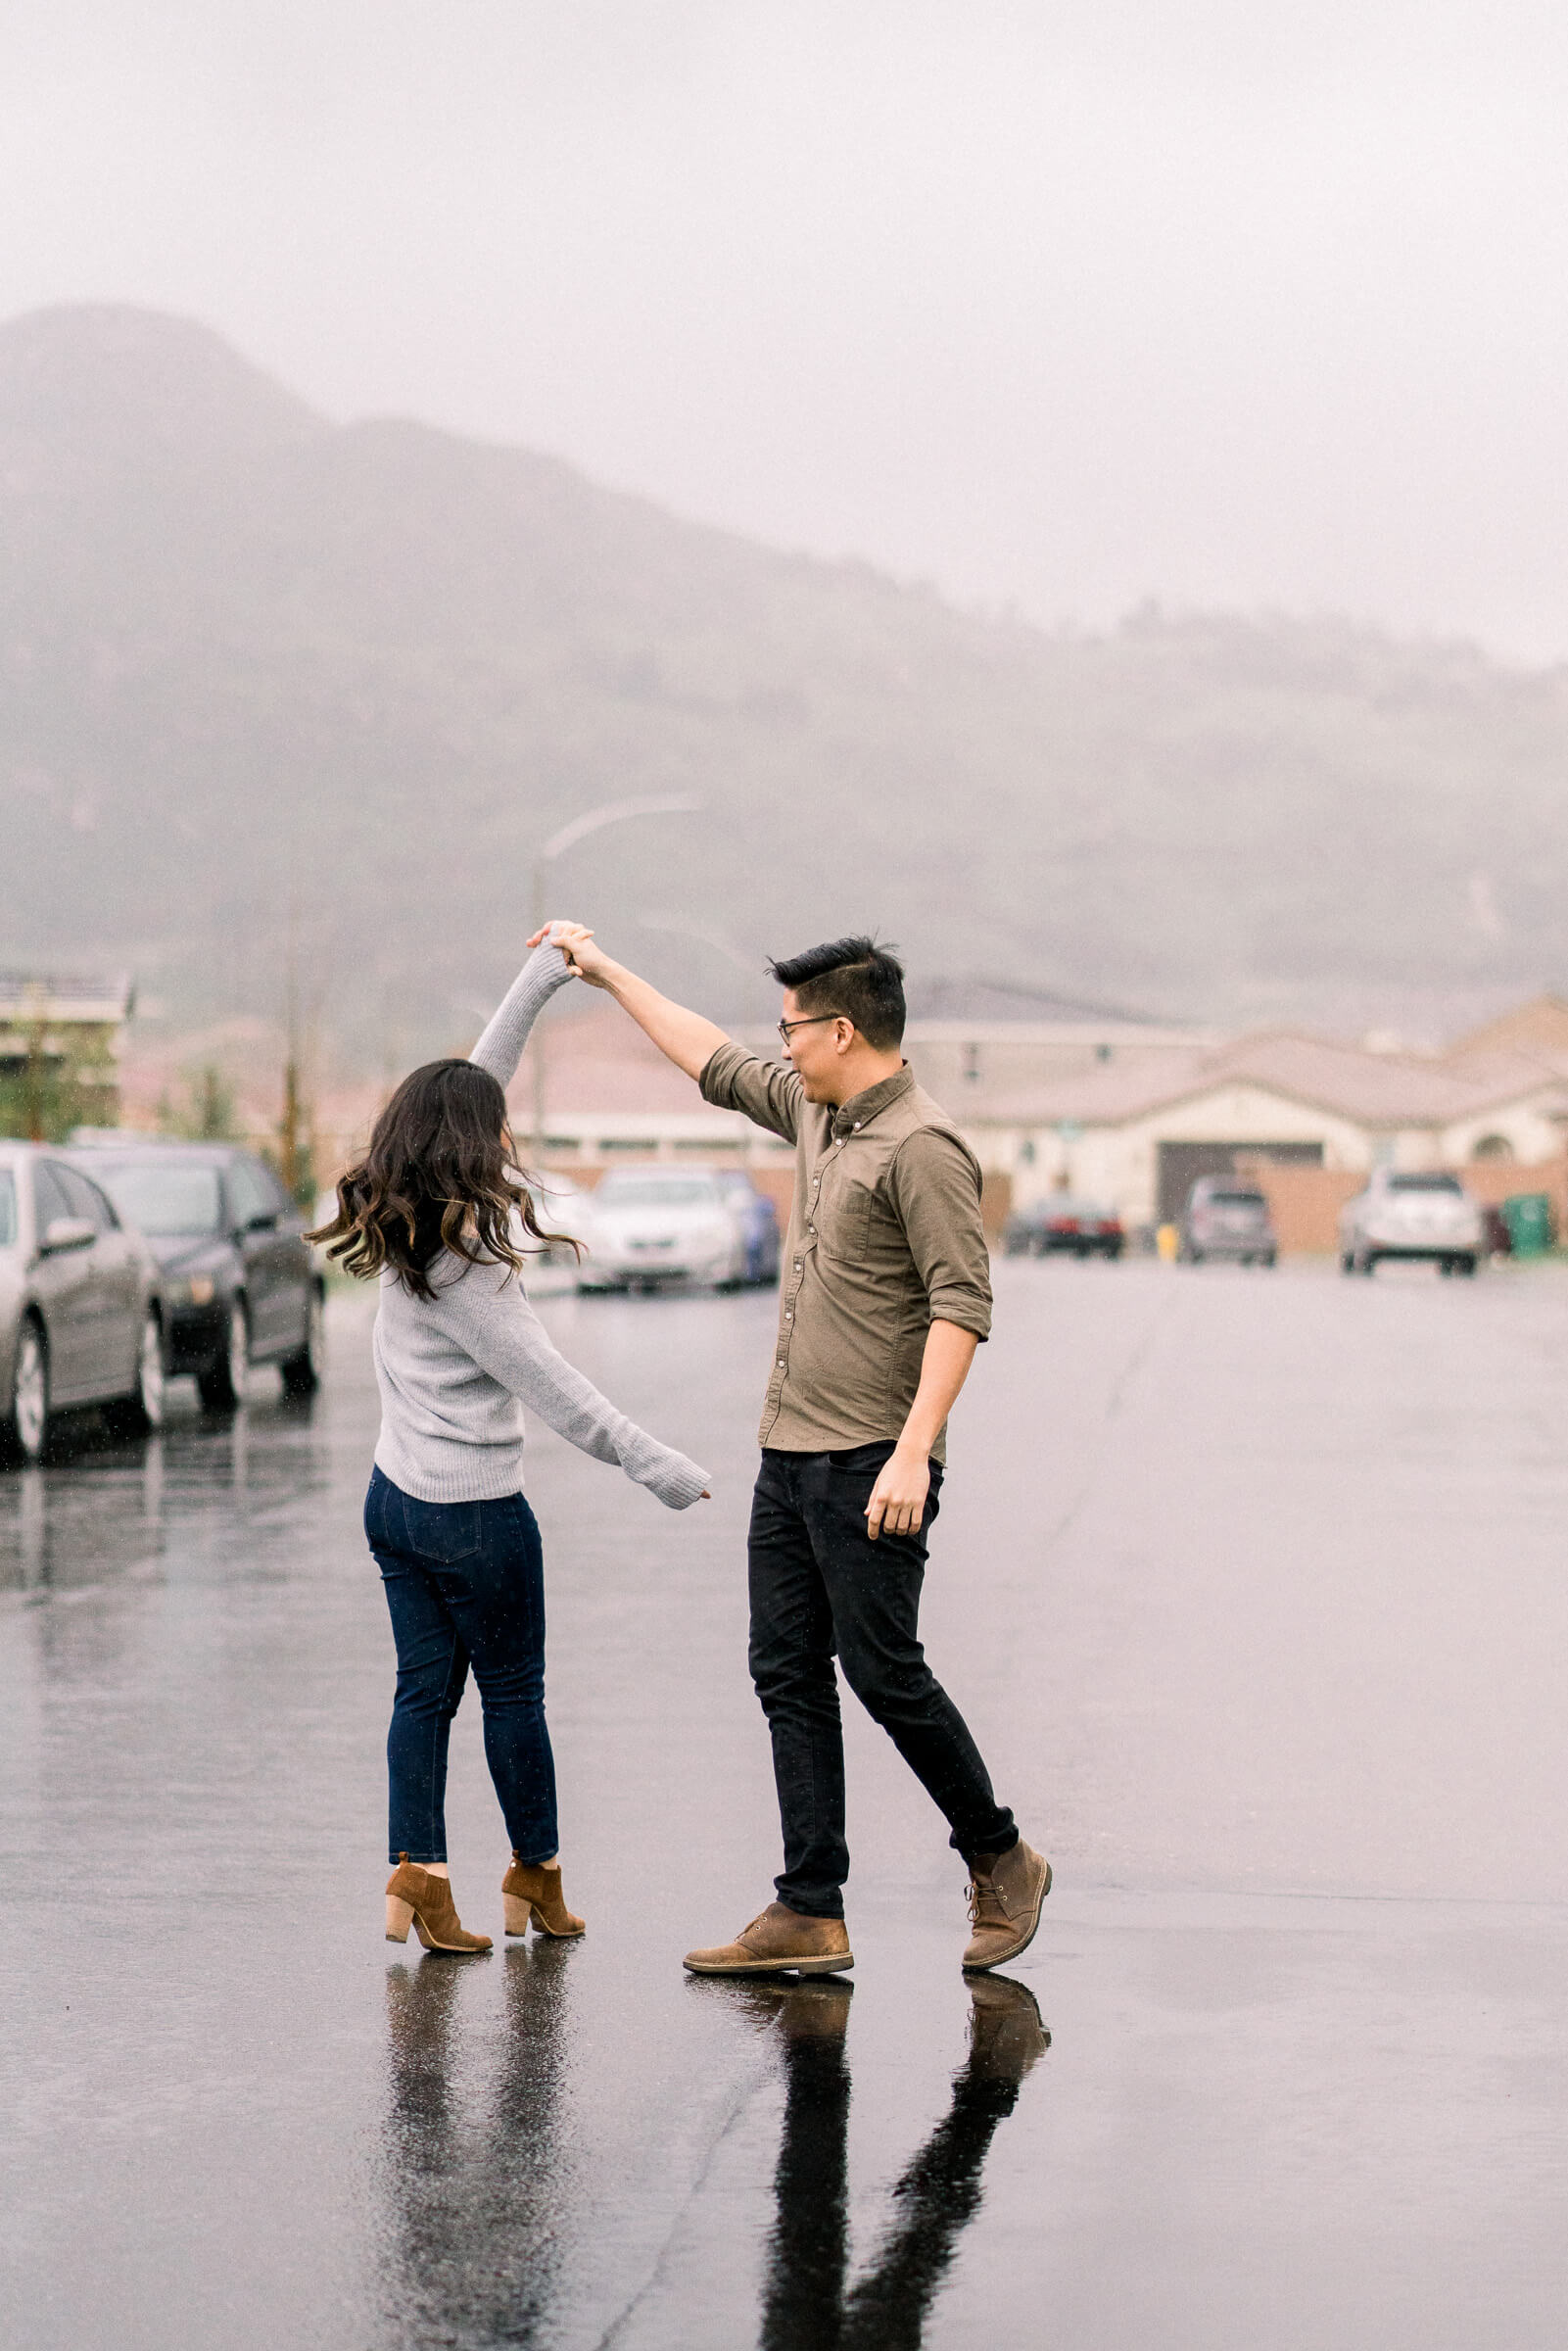 rainy-surprise-proposal-8.jpg